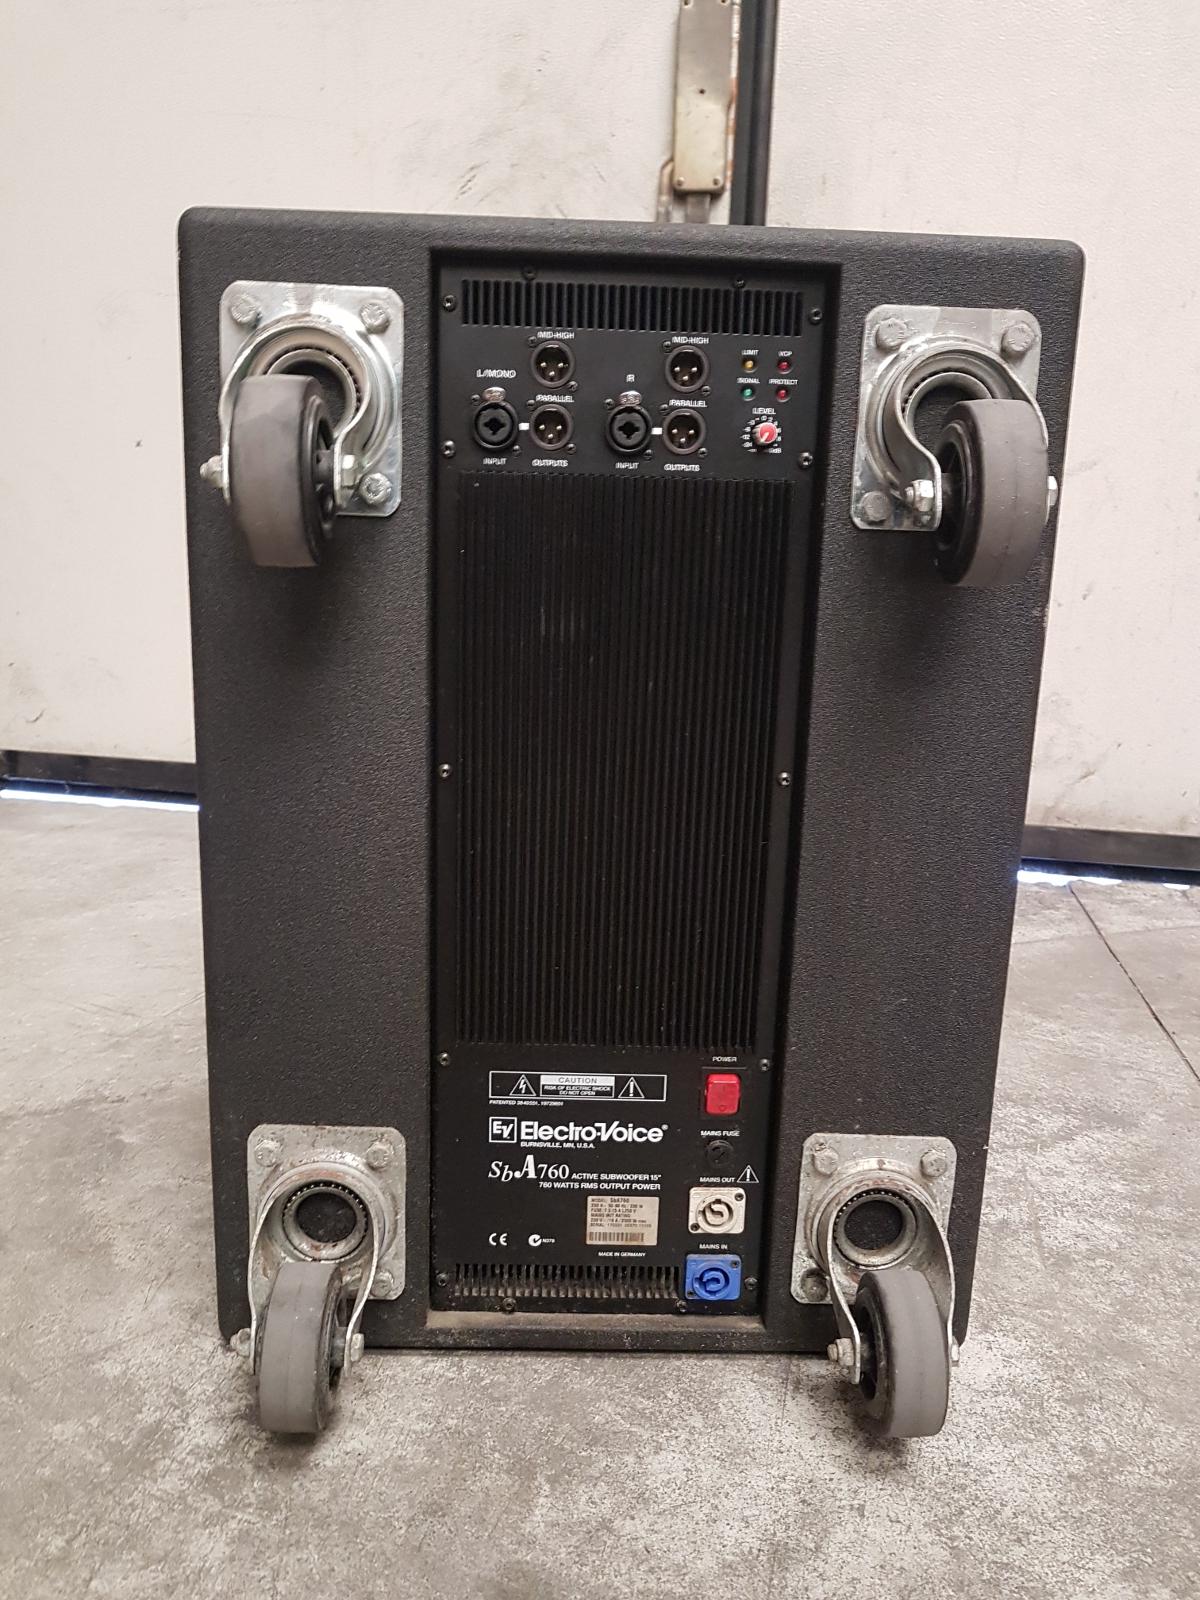 Electrovoice sb a760 subwoofer attivo 760 watt woofer 15 usato - Subwoofer attivo casa ...